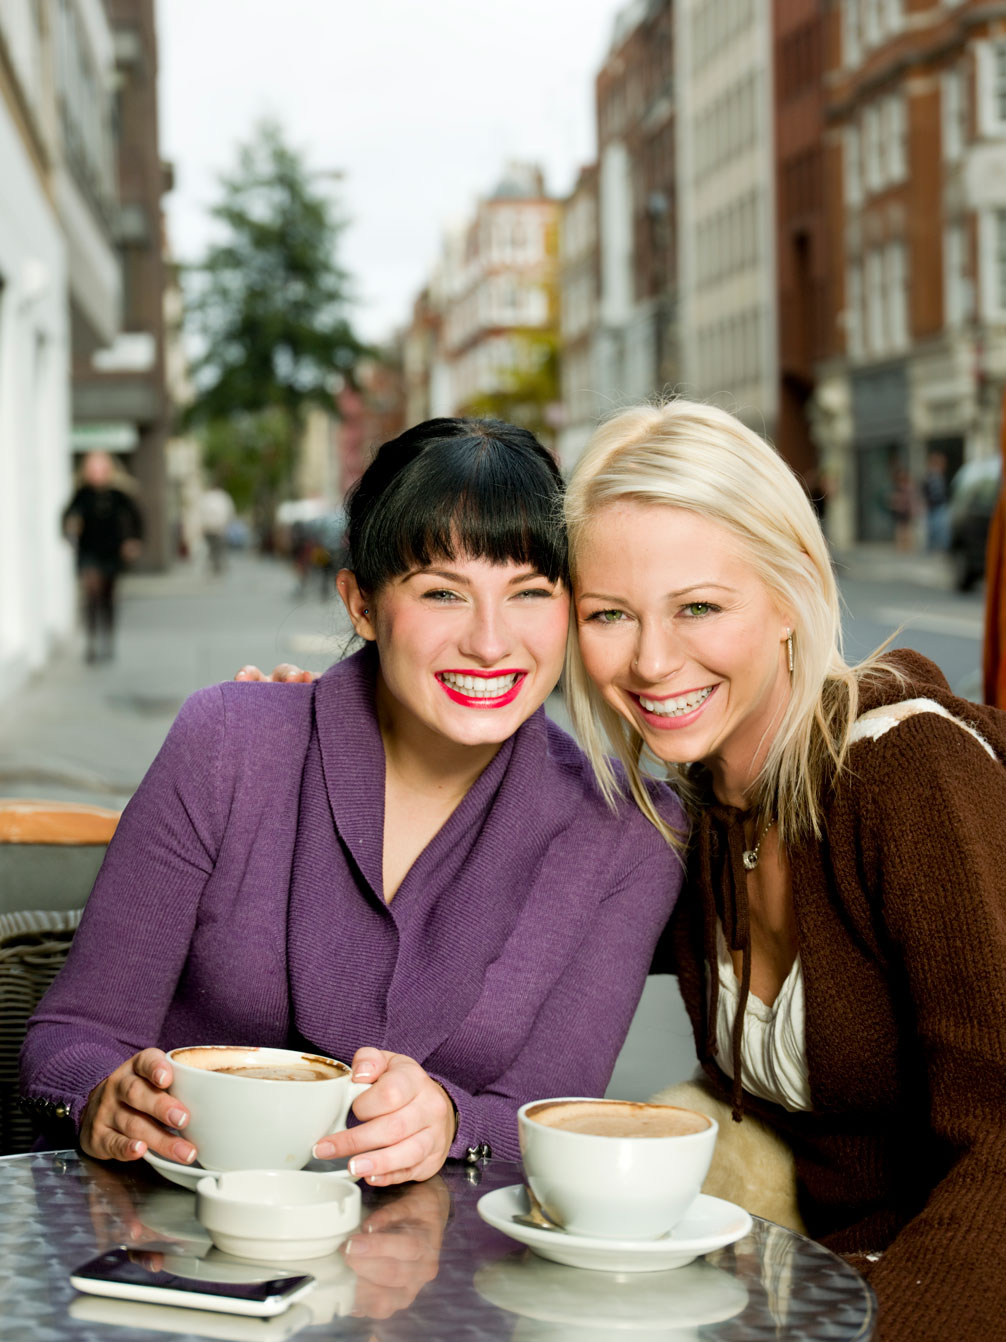 Two Girls Having Warm Coffees